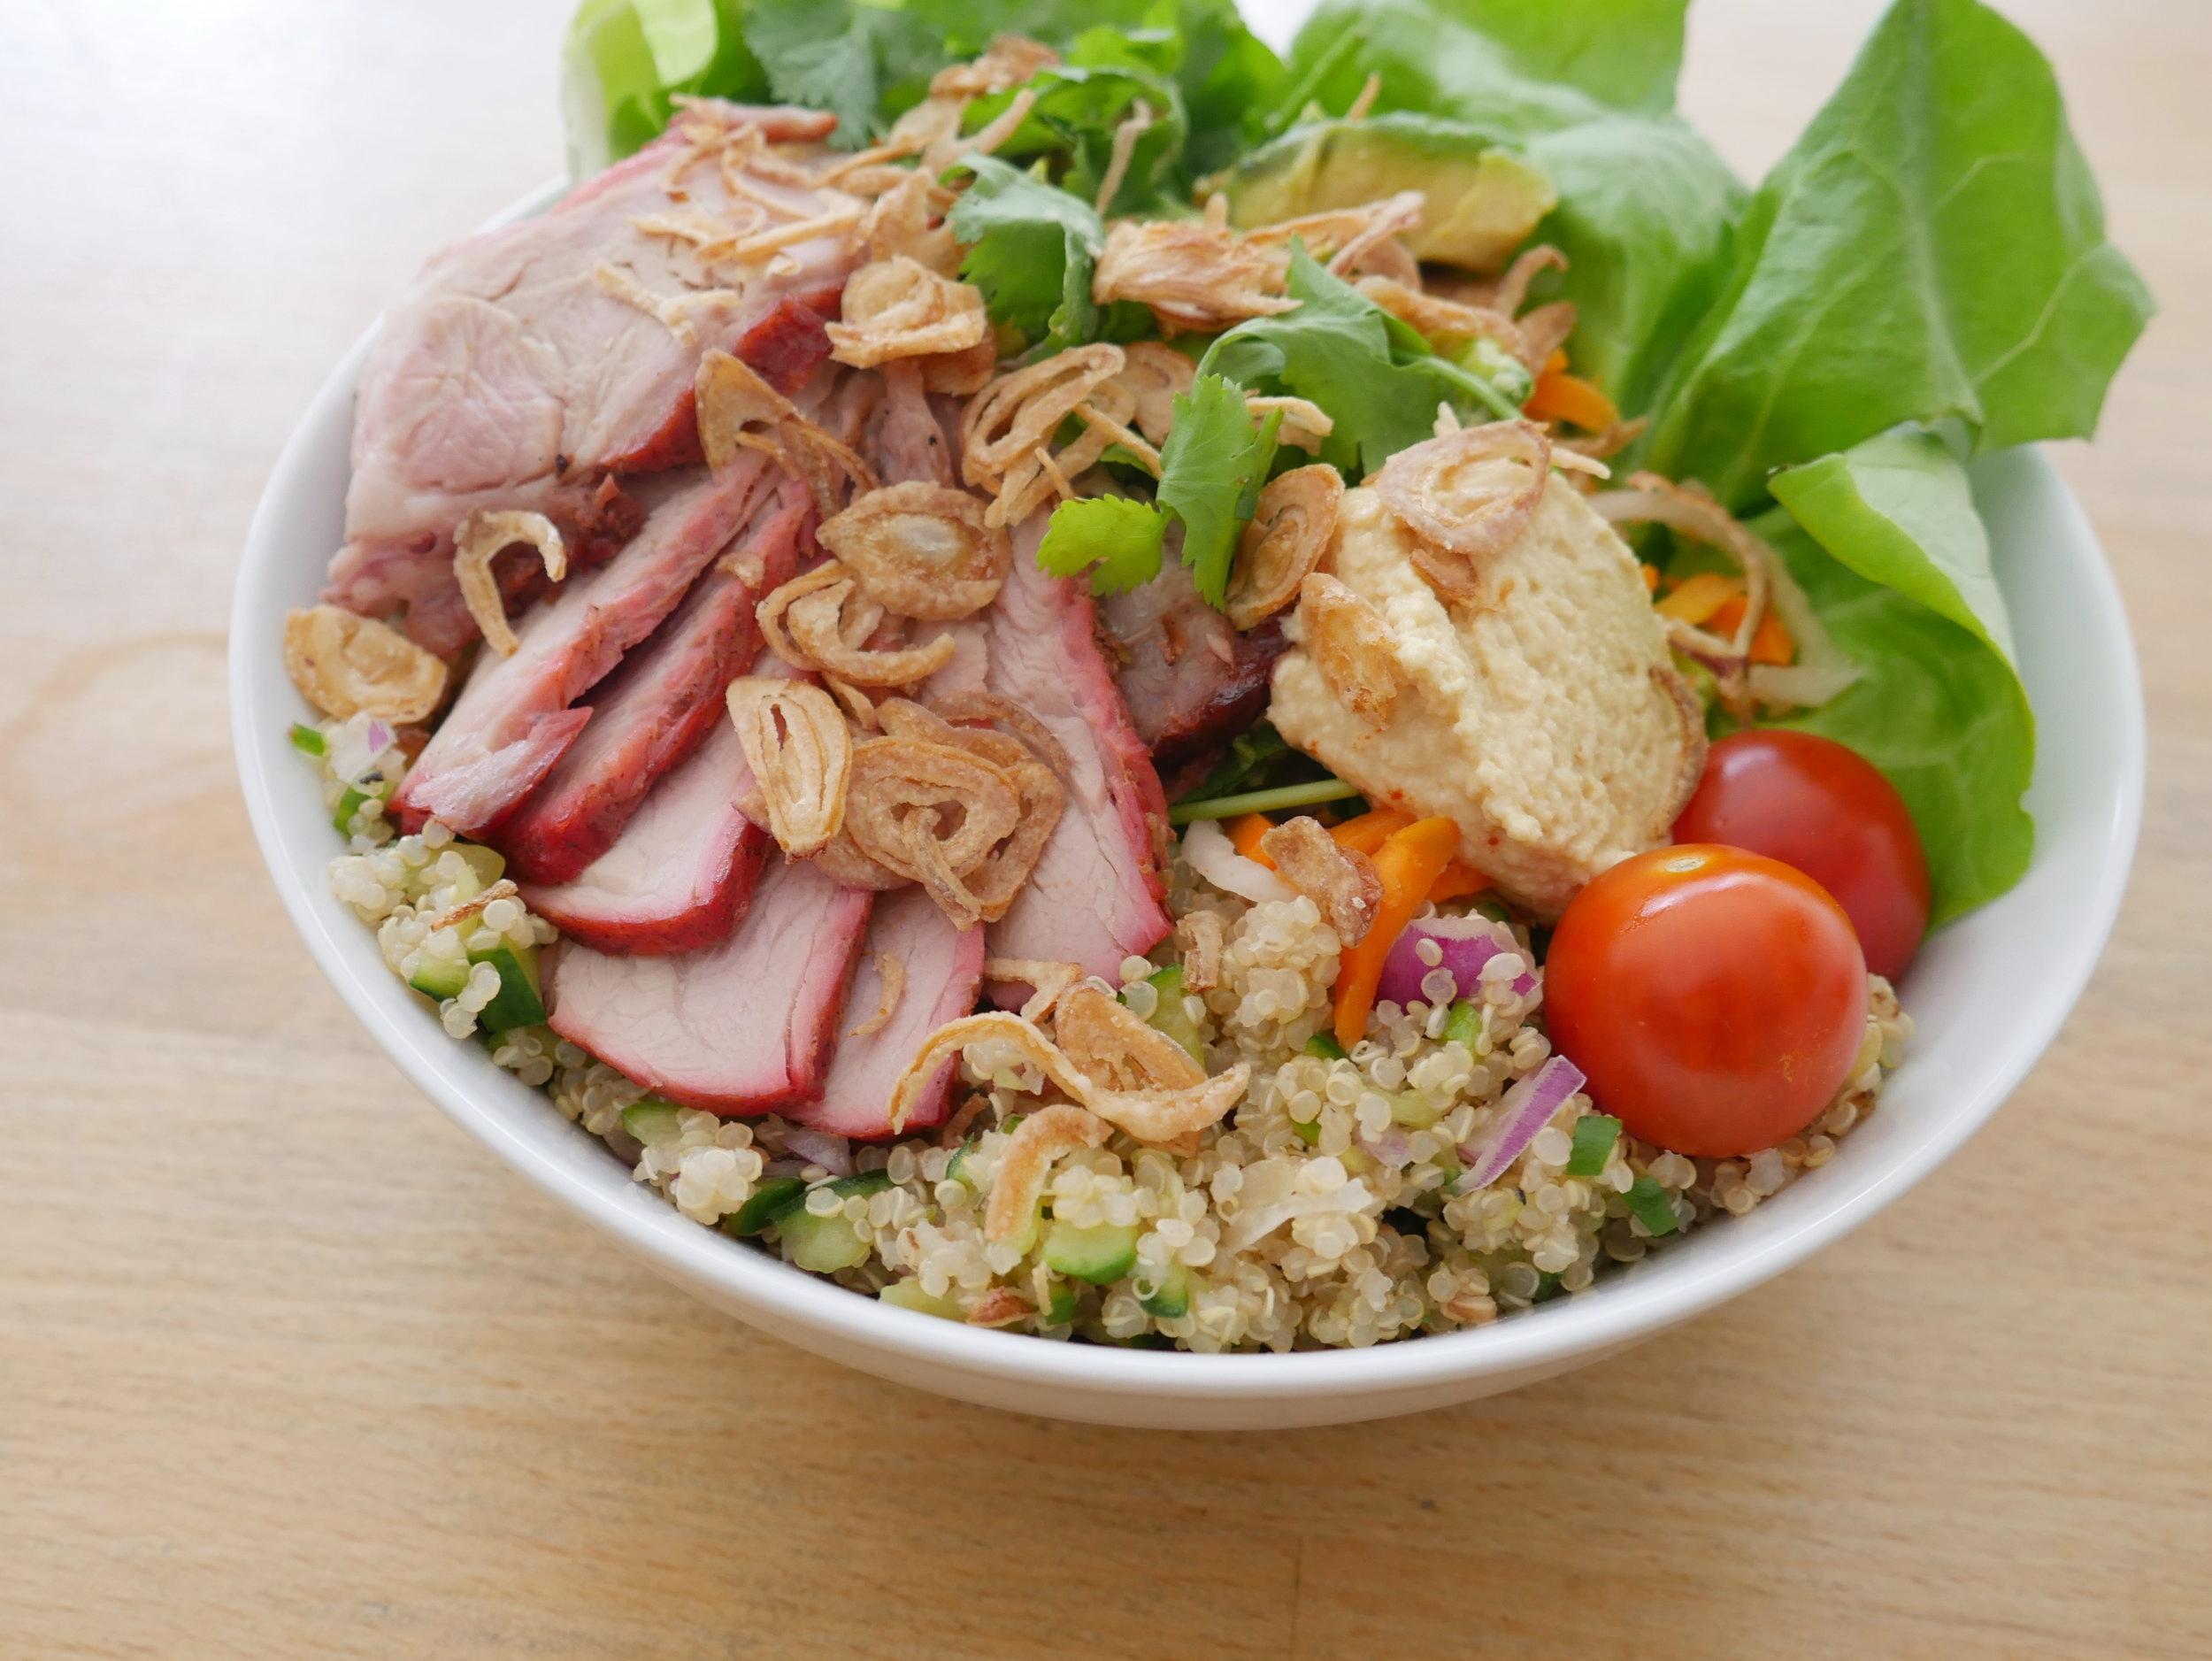 BBQ Roasted Pork Quinoa Salad